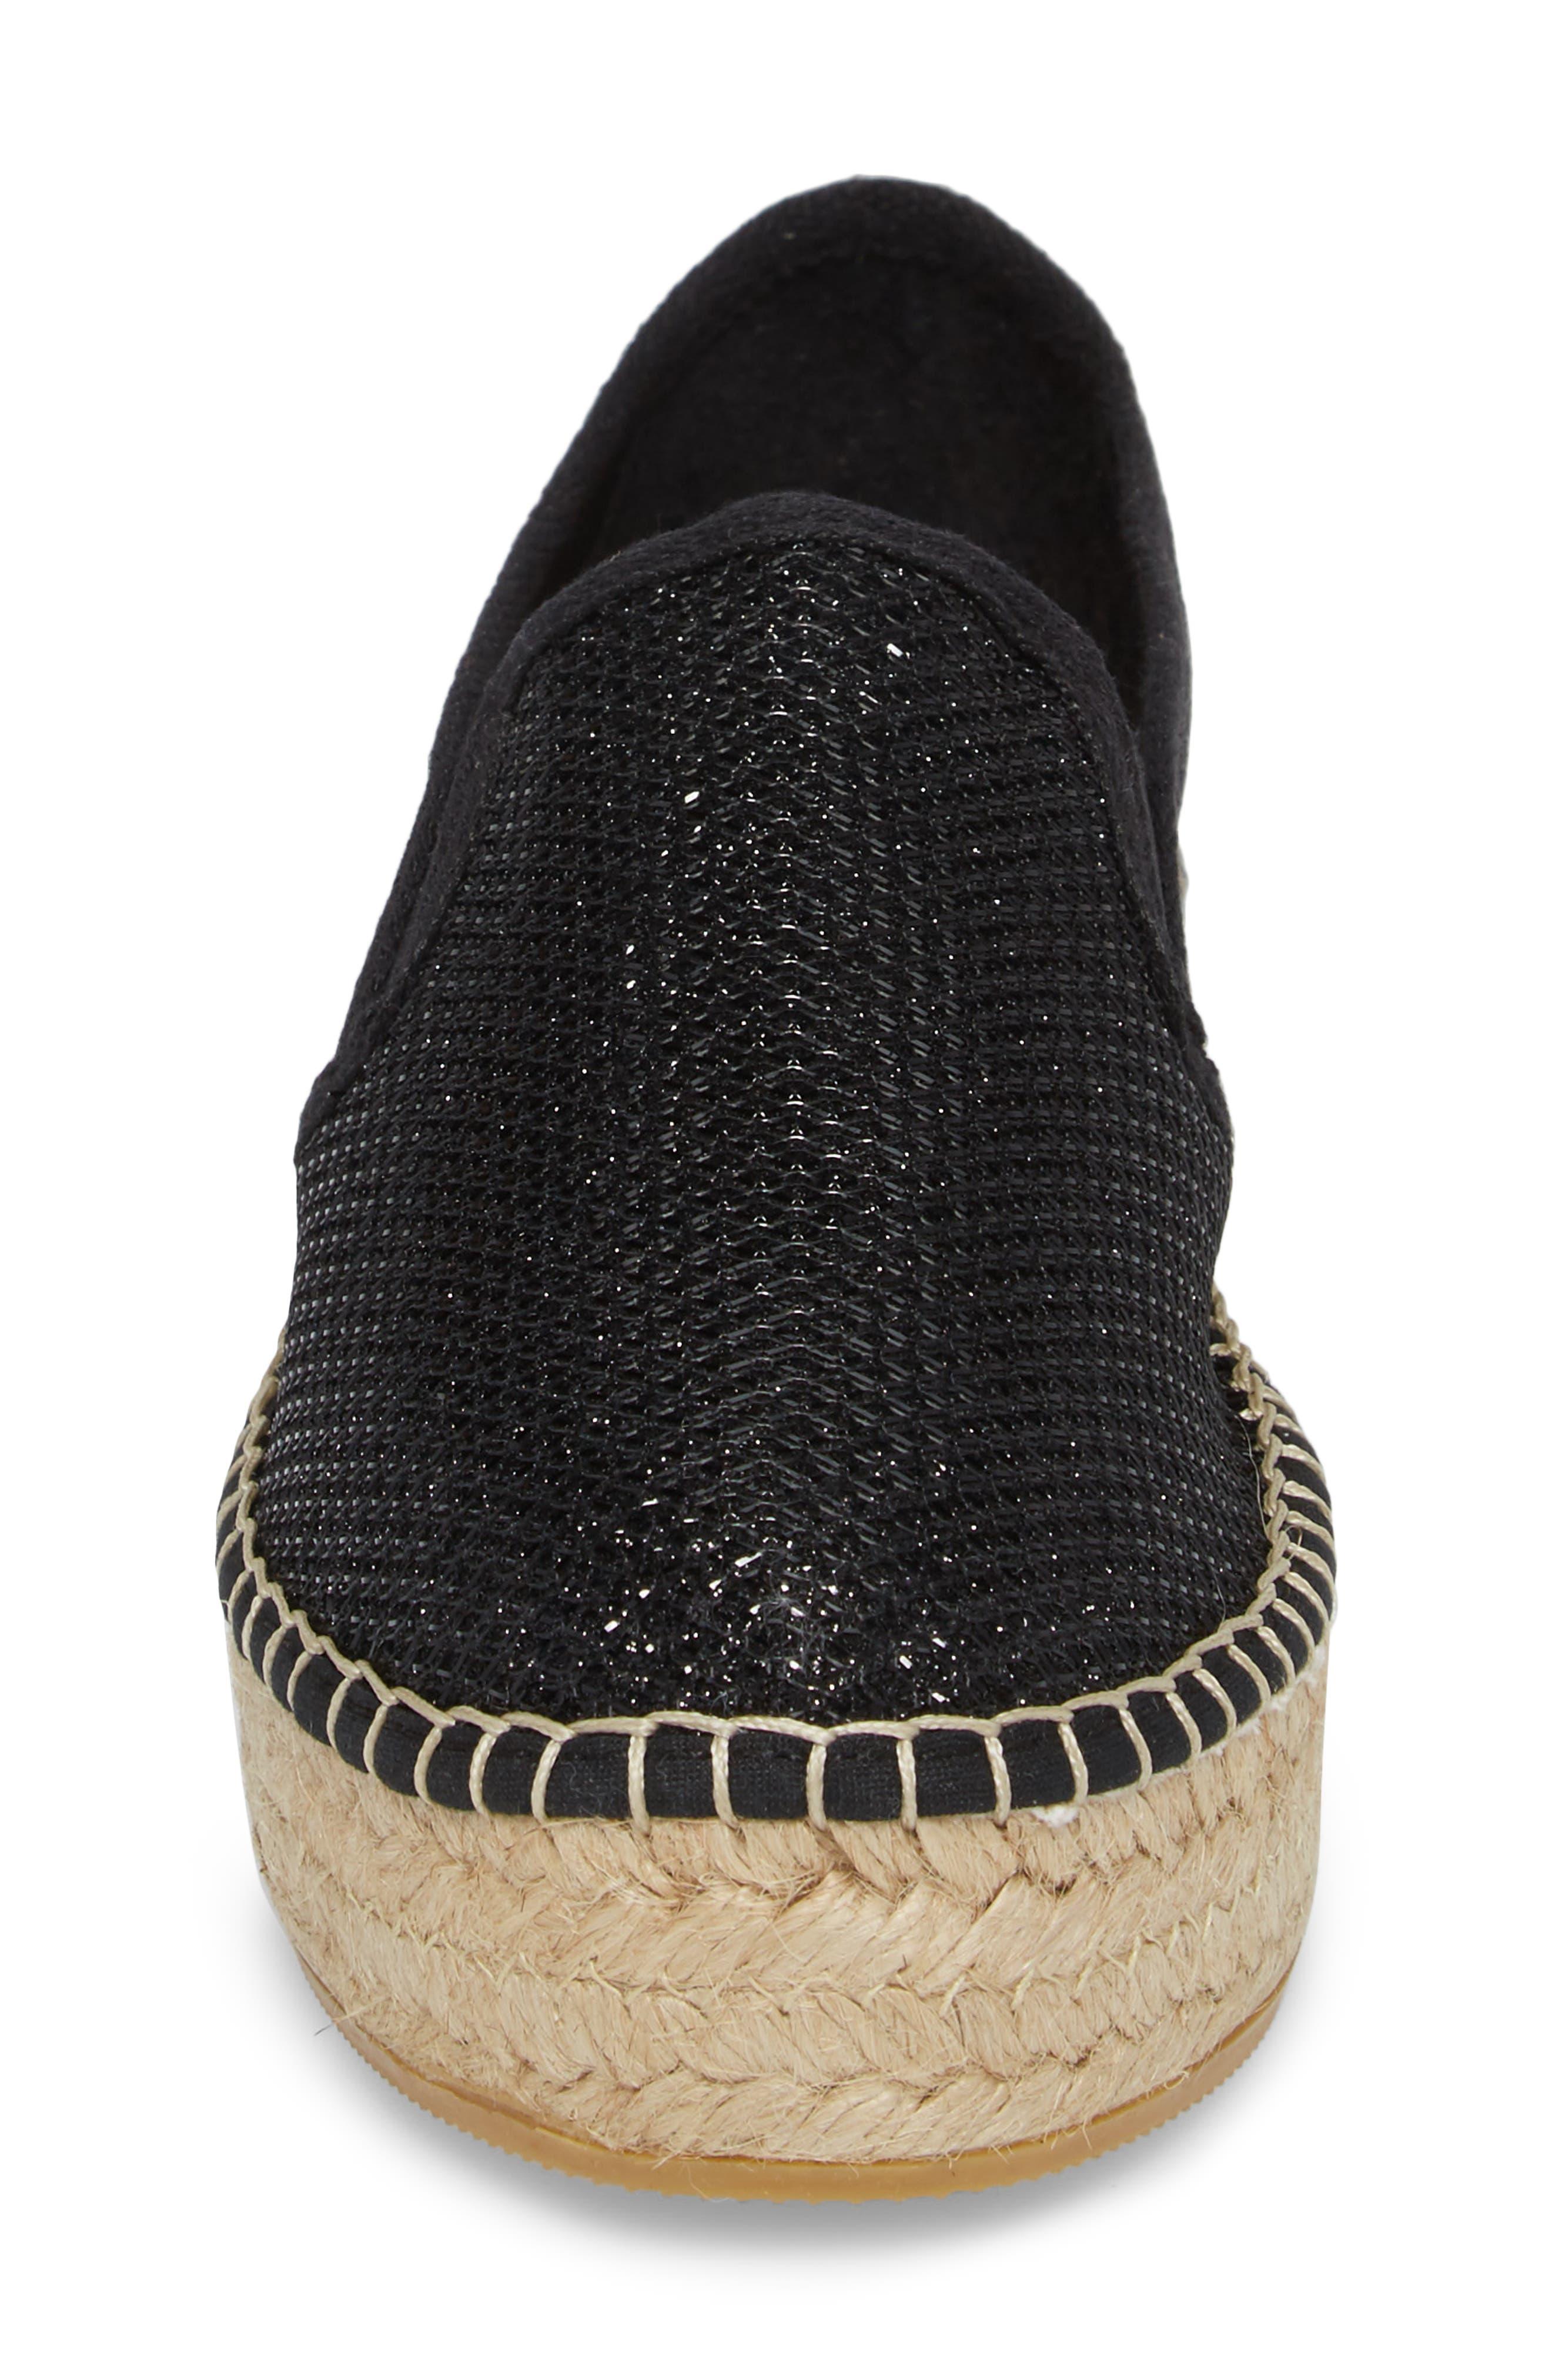 Fonda Platform Espadrille Sneaker,                             Alternate thumbnail 4, color,                             BLACK FABRIC